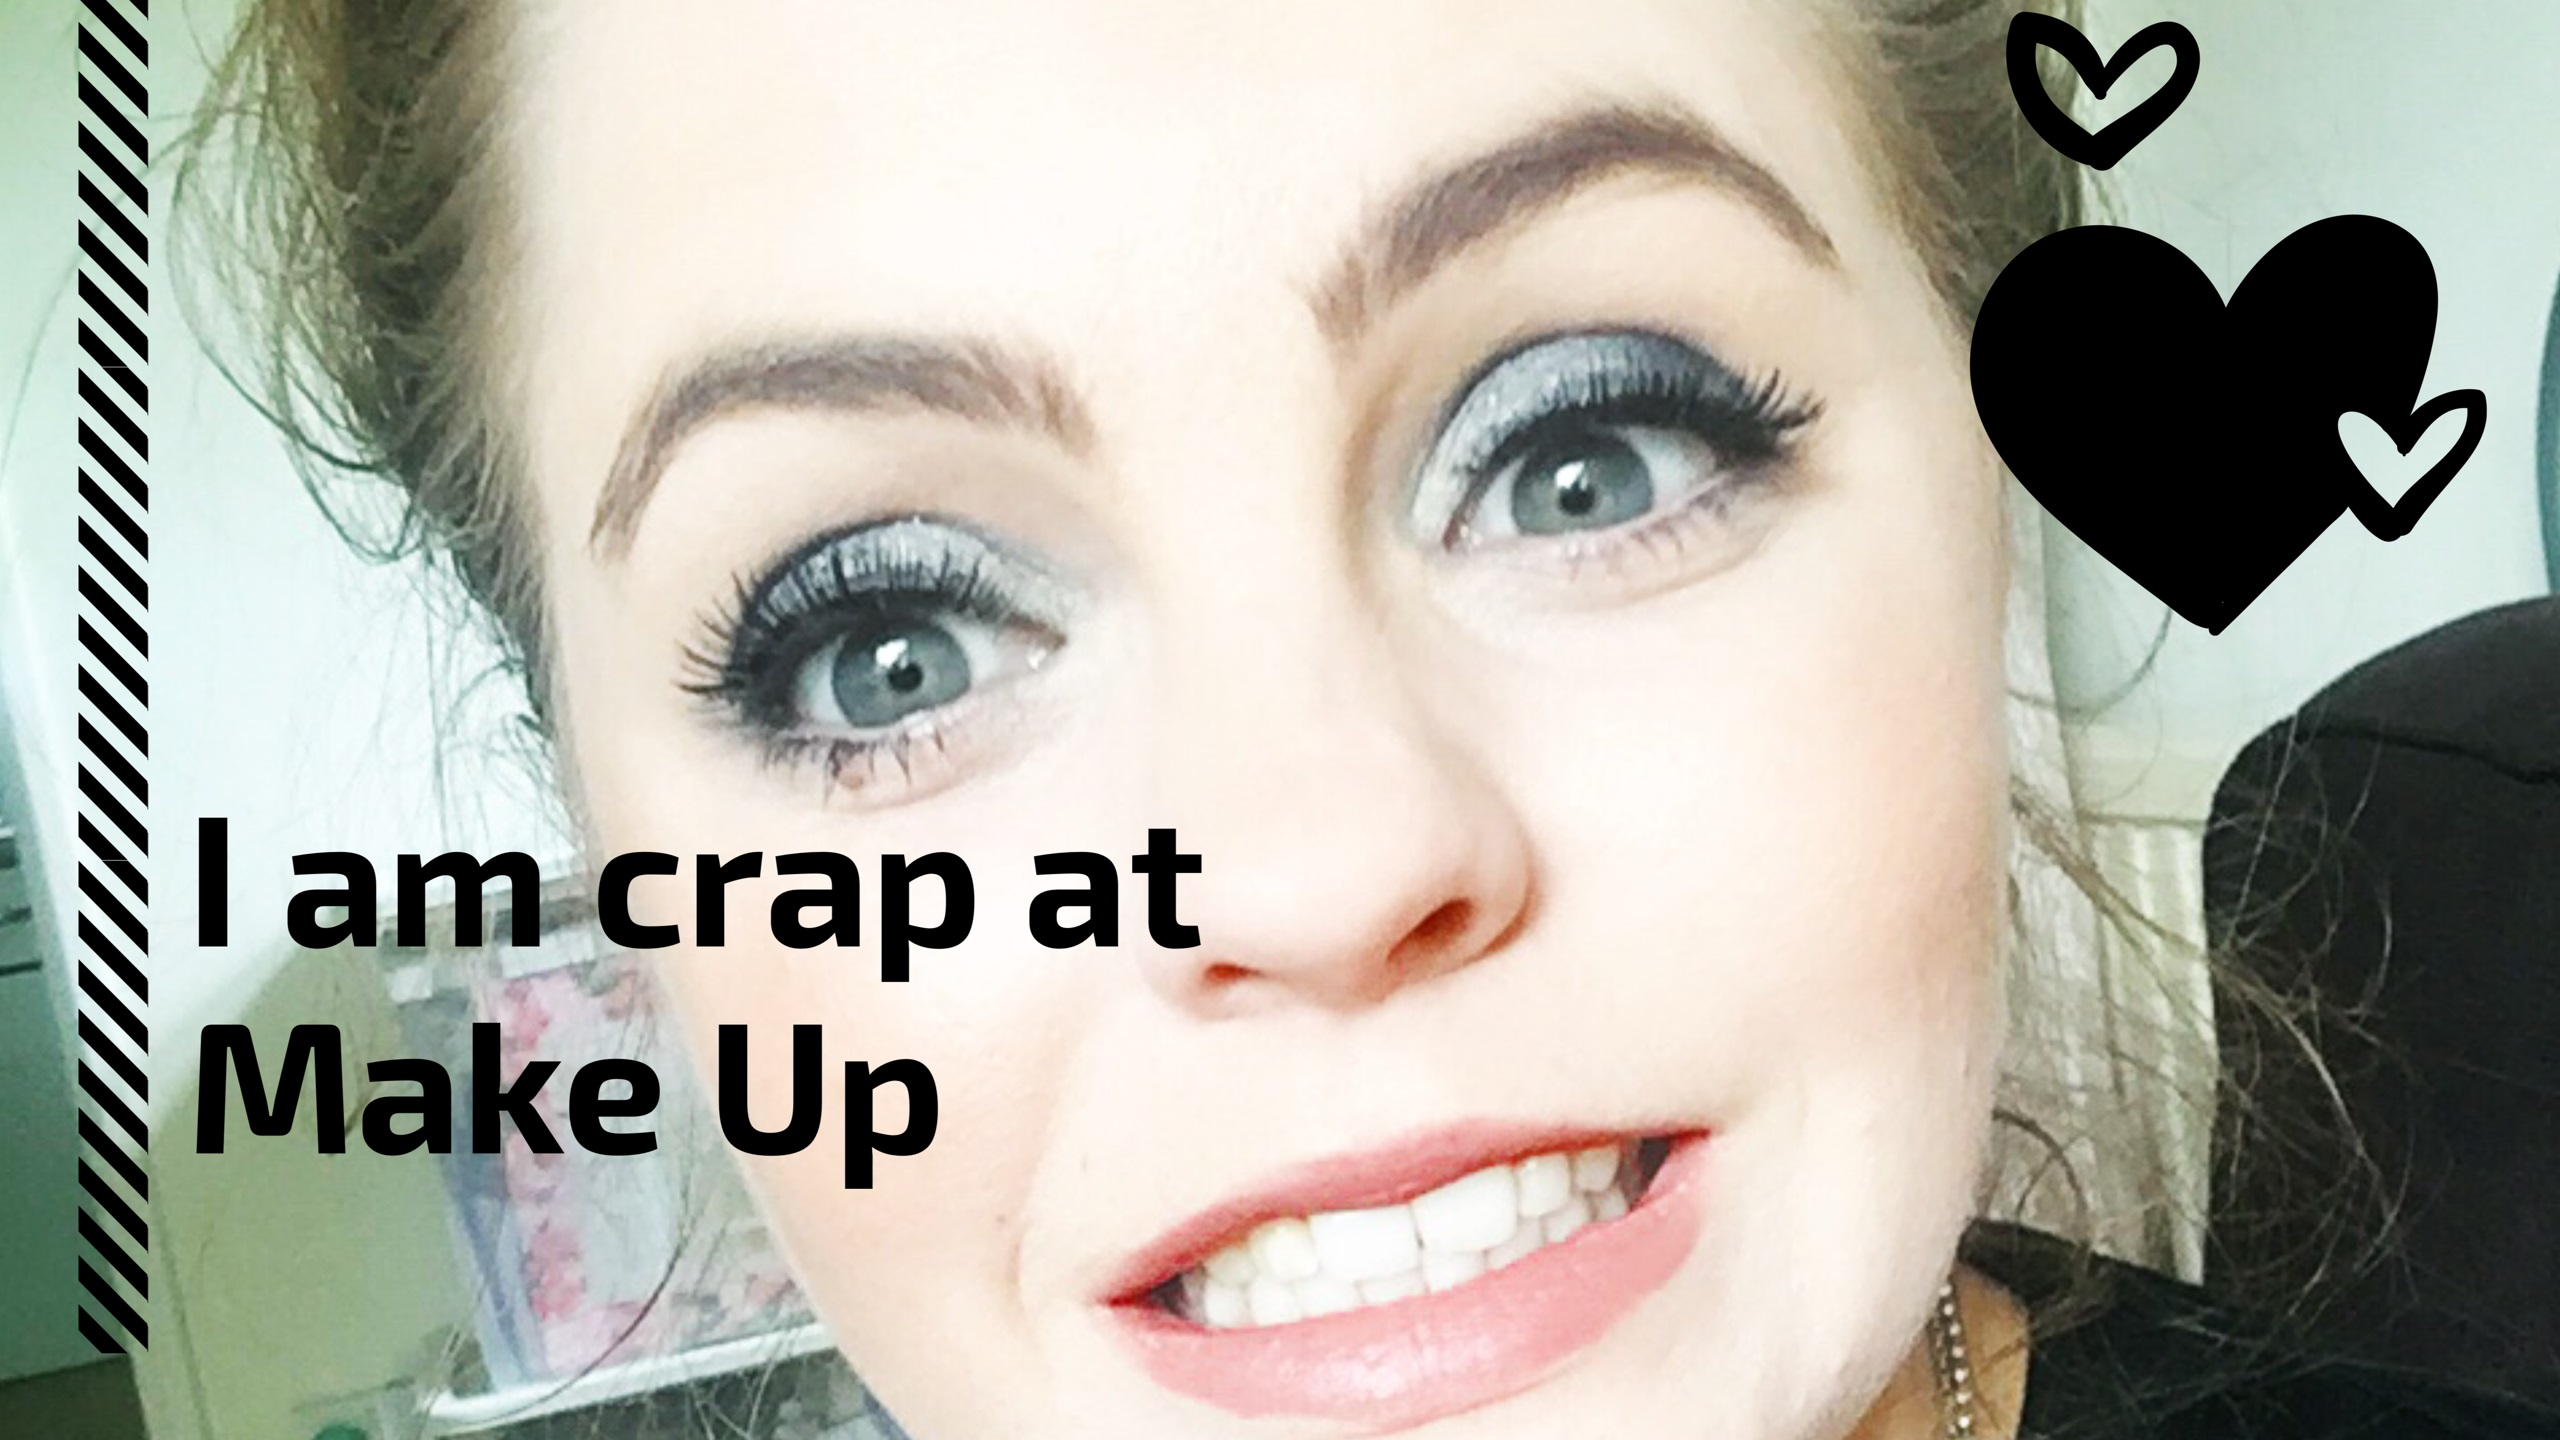 Im crap at Make Up (1)